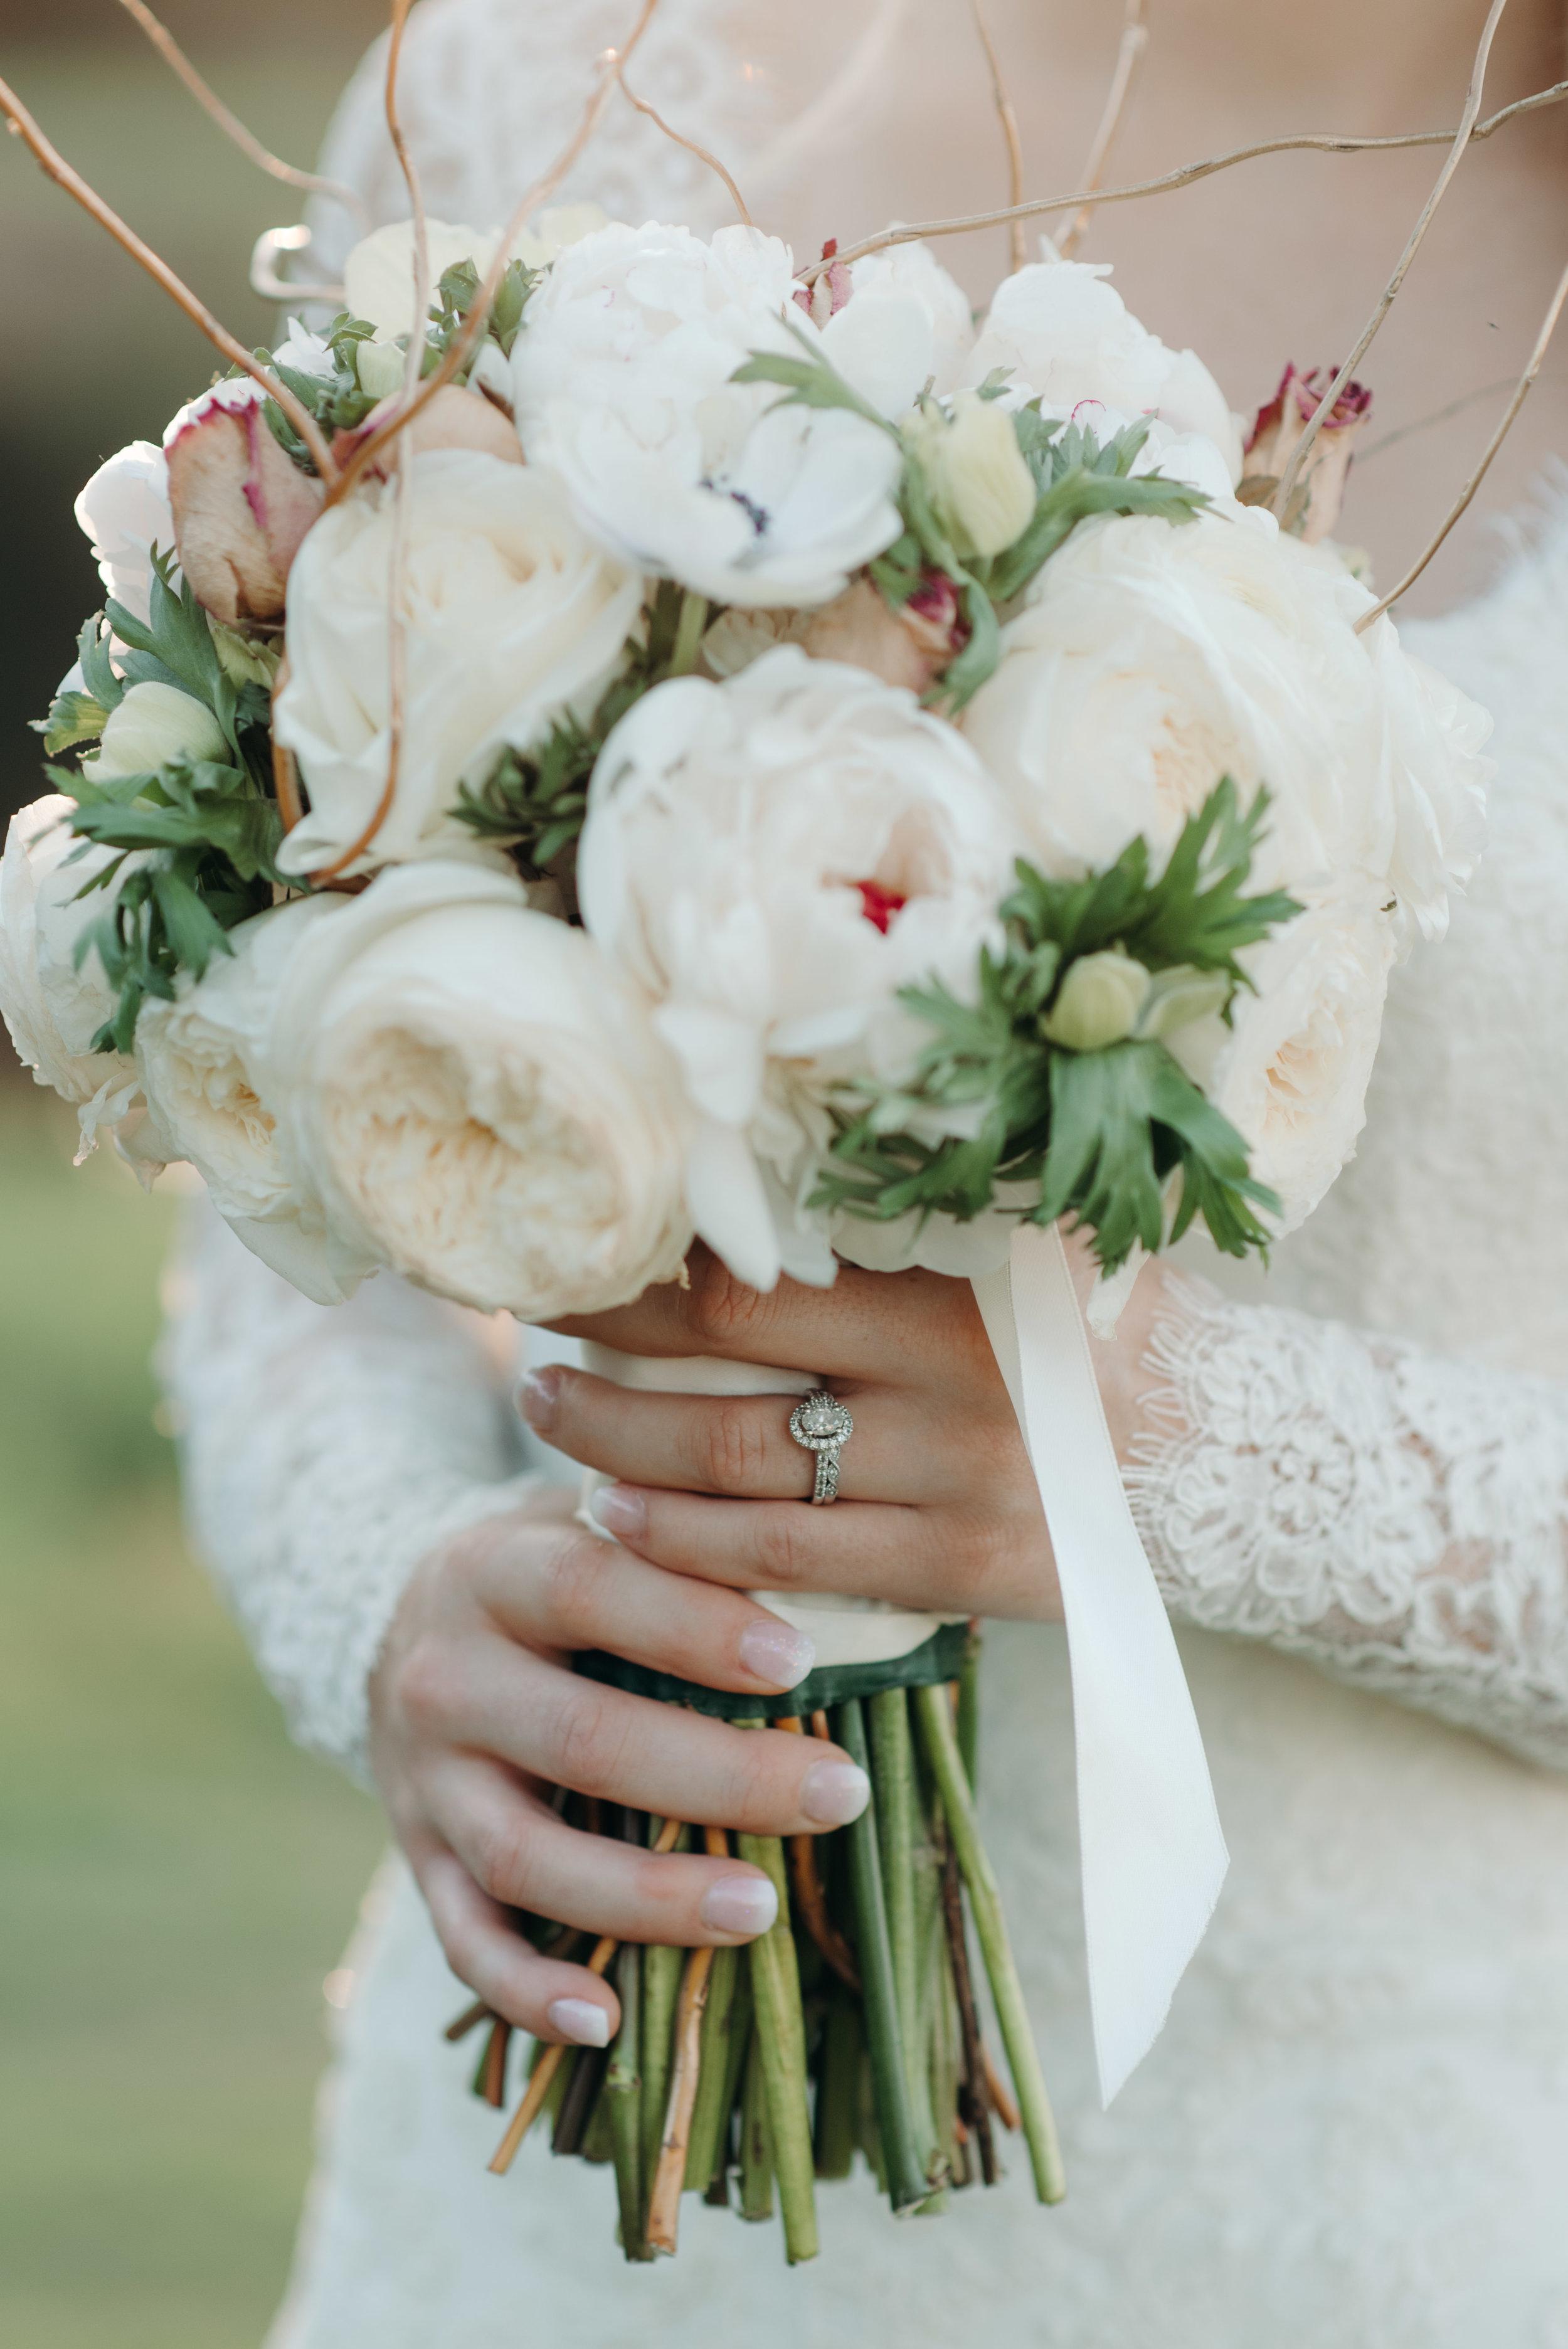 micayla-greyson-neumann-vero-beach-lake-house-winter-white-wedding-photography-836.jpg